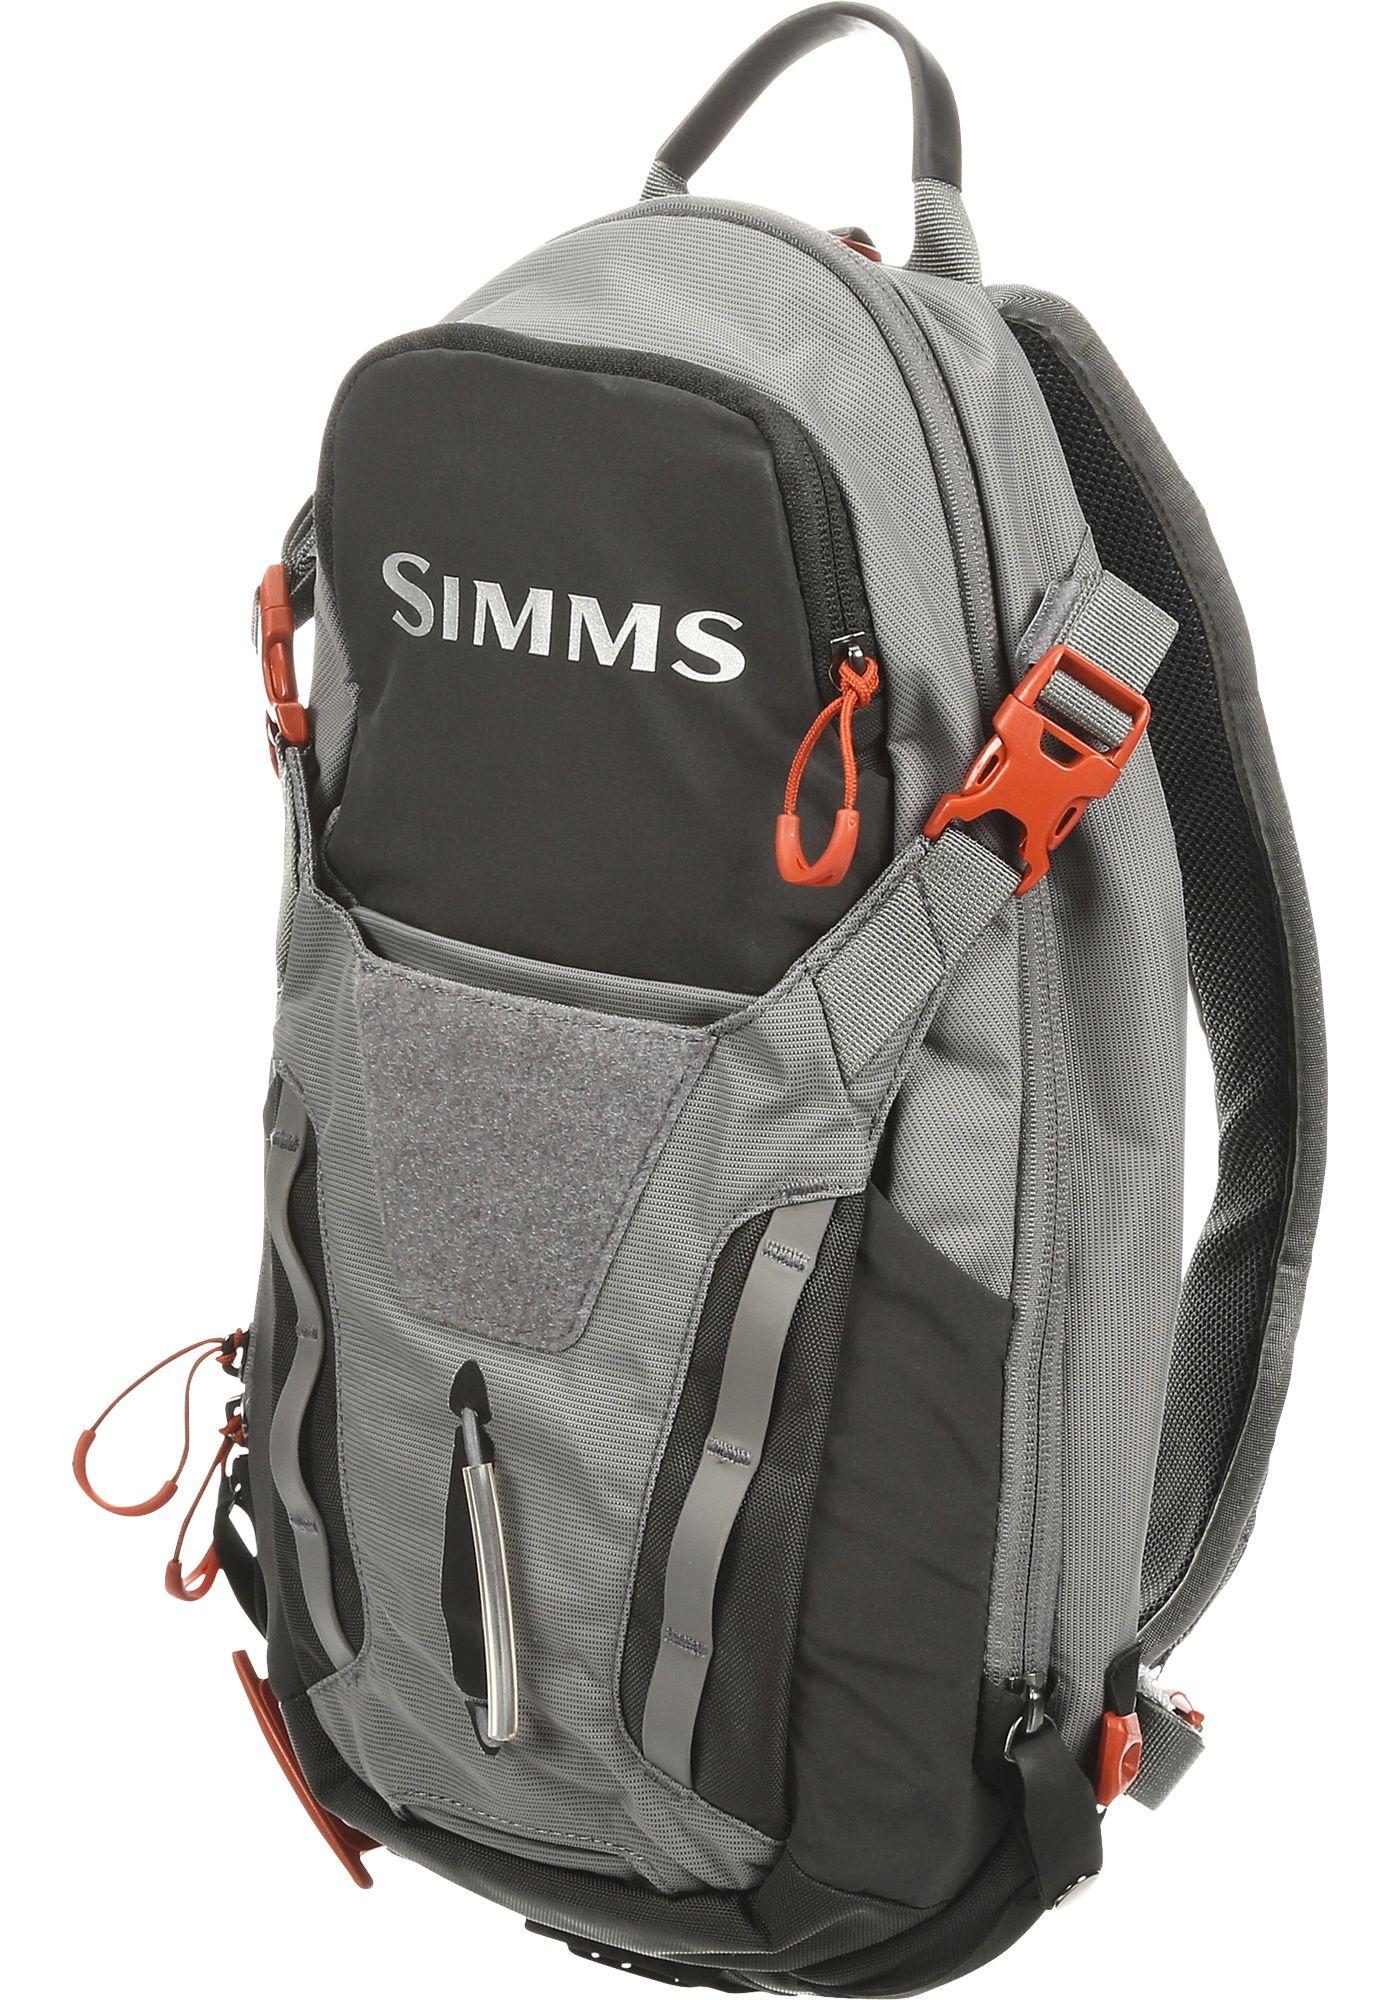 Simms Freestone Ambidextrous Tactical Fishing Sling Pack